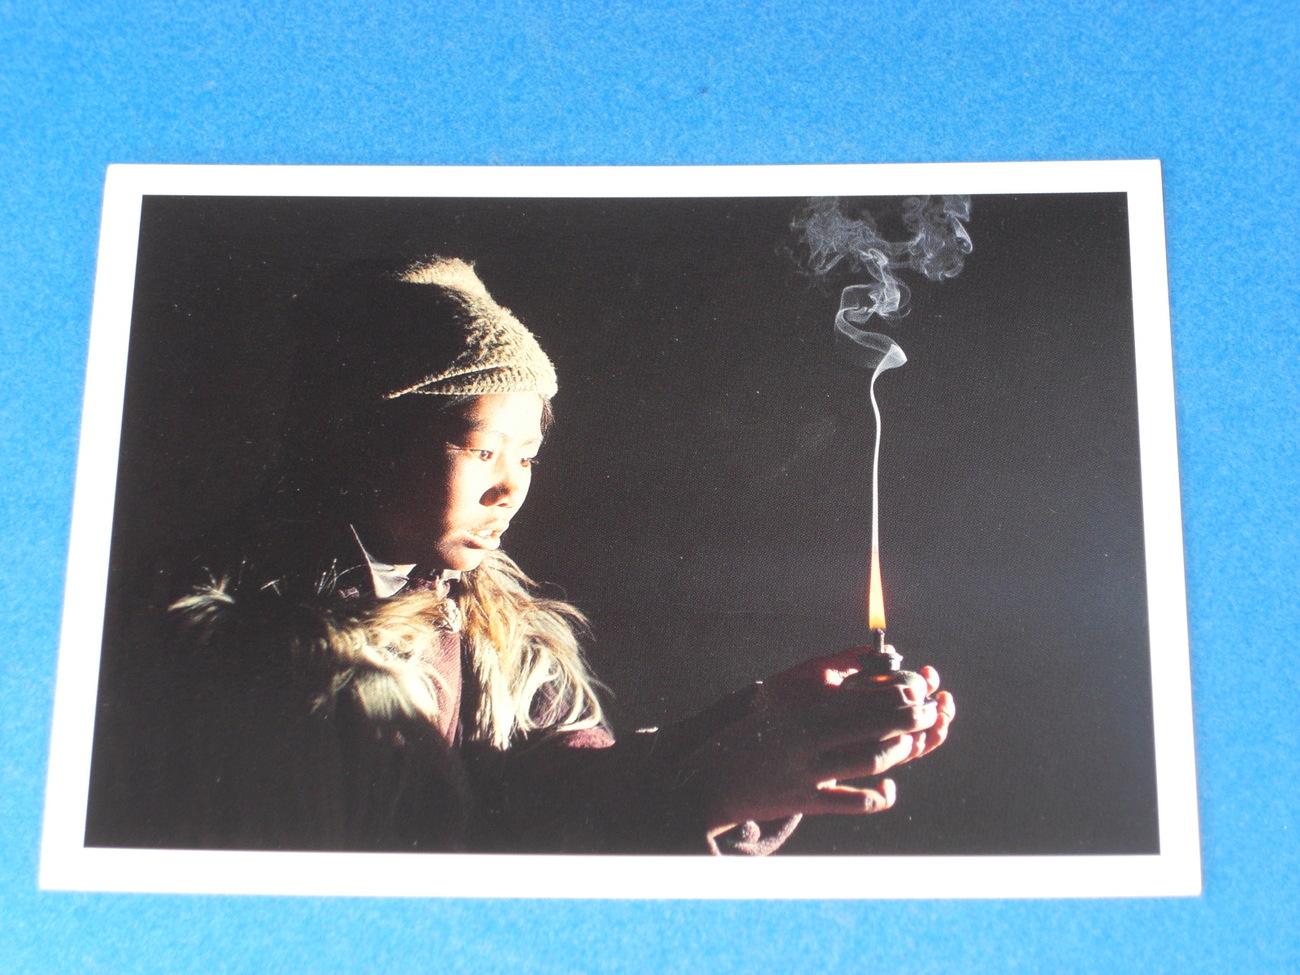 Nouvelles Images Postcard Girl of Zanskar/Chenzom Au Zanskar by Olivier Föllmi